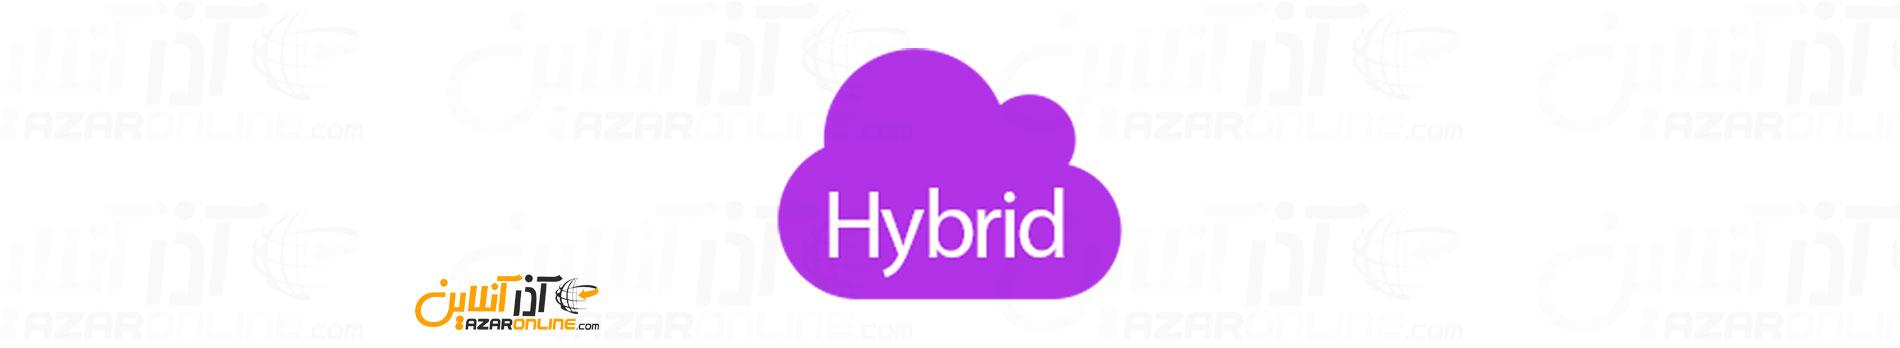 ابر ترکیبی ( Hybrid Cloud )